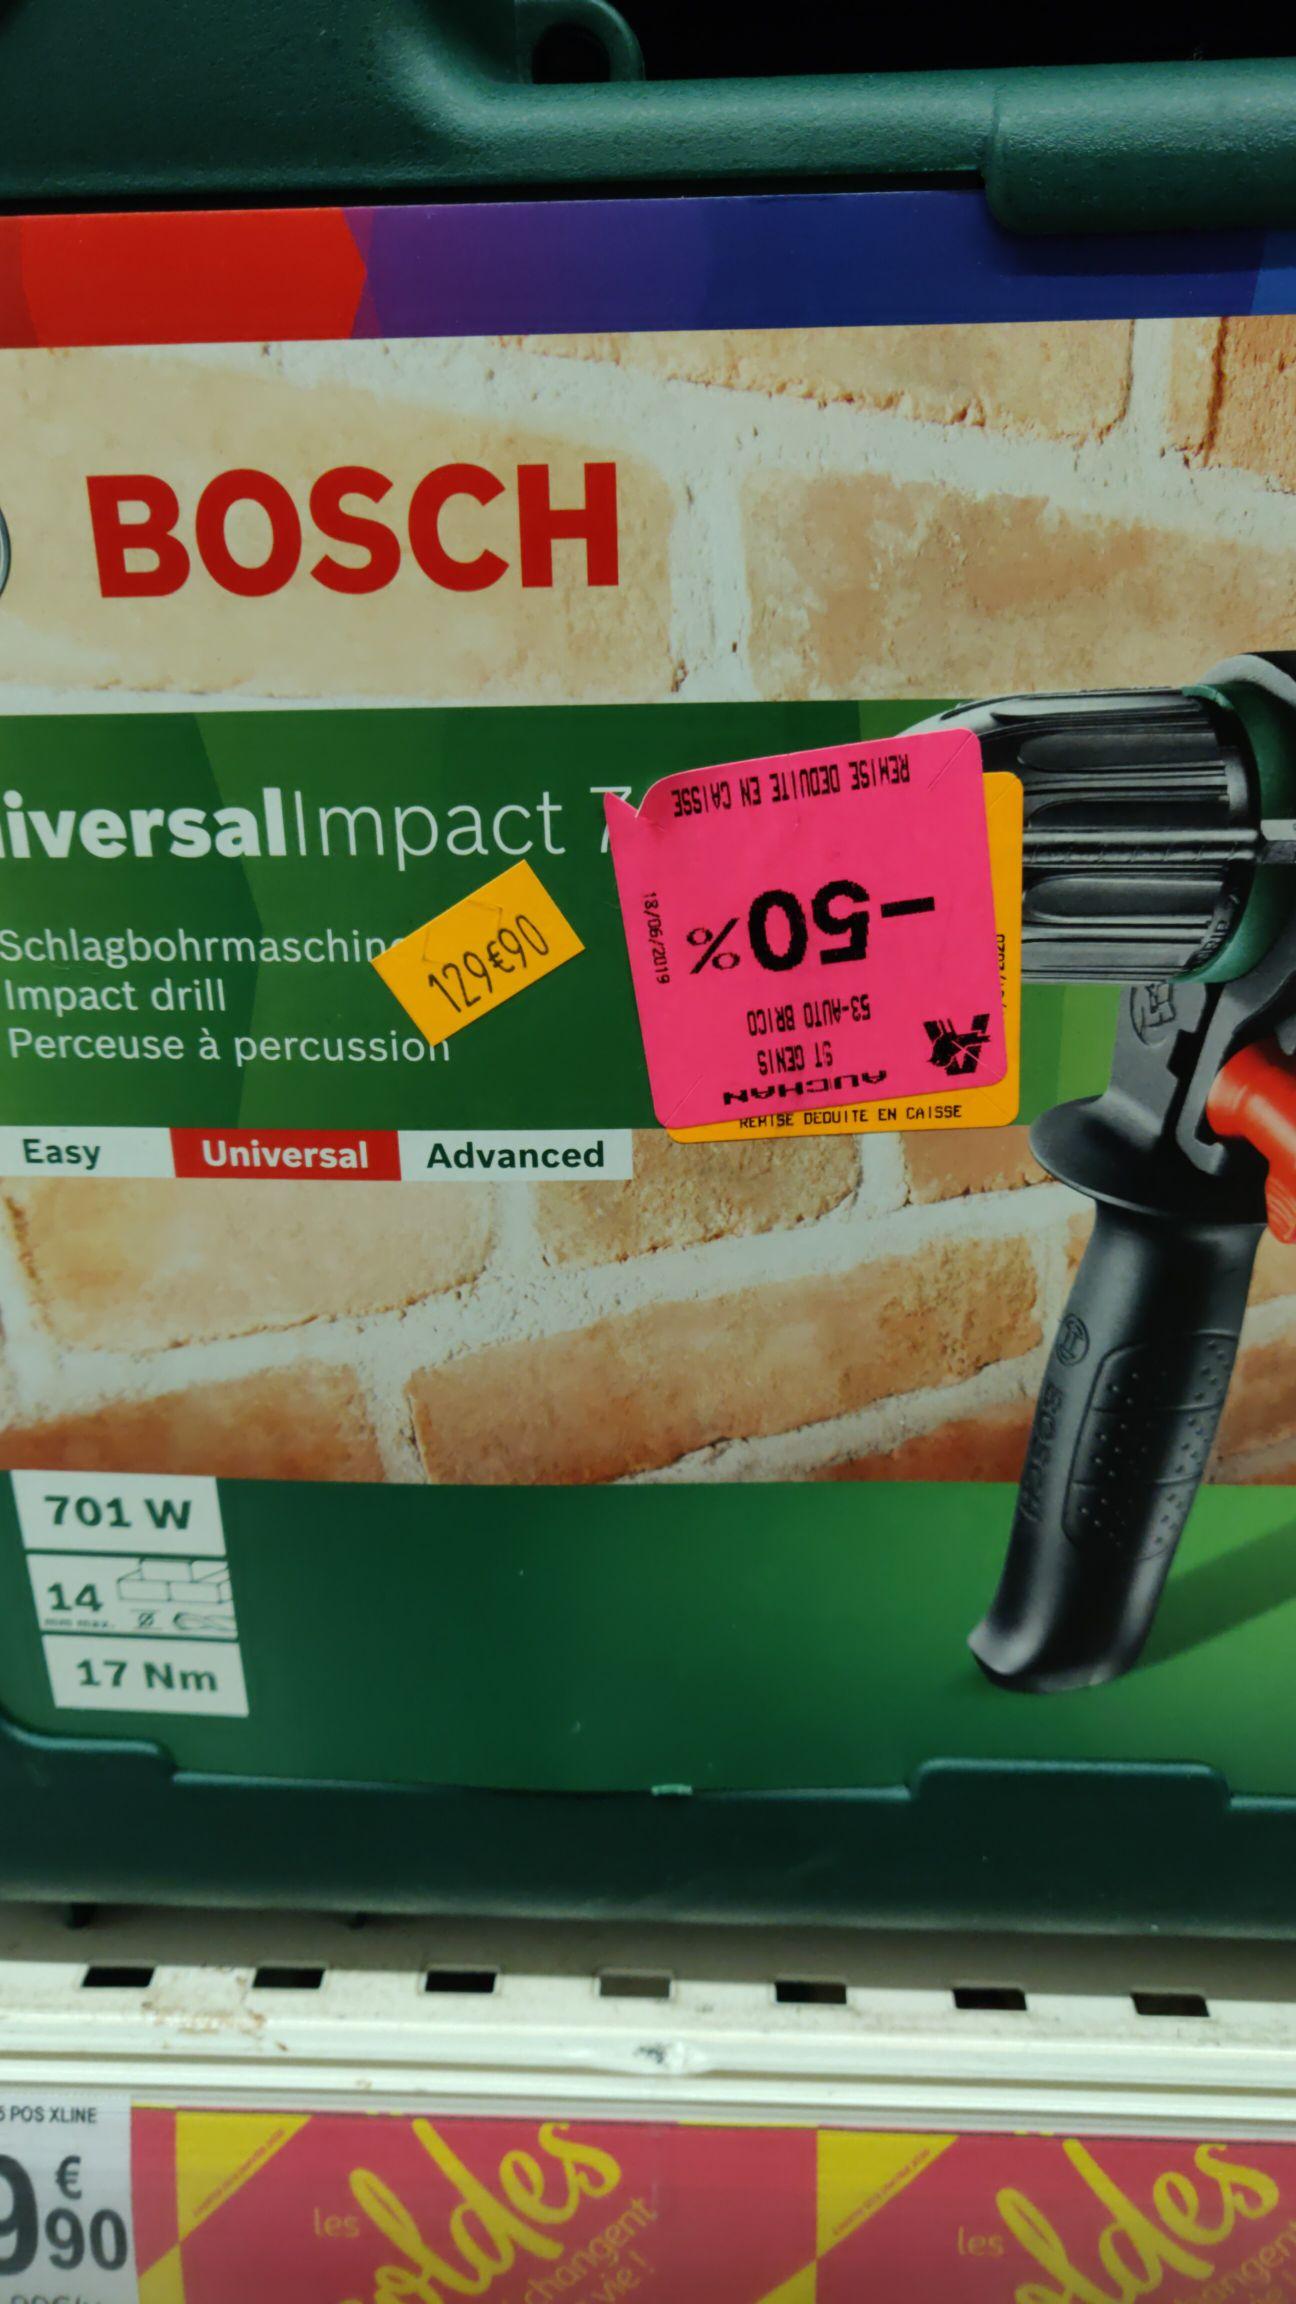 Perceuse à percussion Bosch Universal Impact - 700W - Saint-Genis-Laval (69)